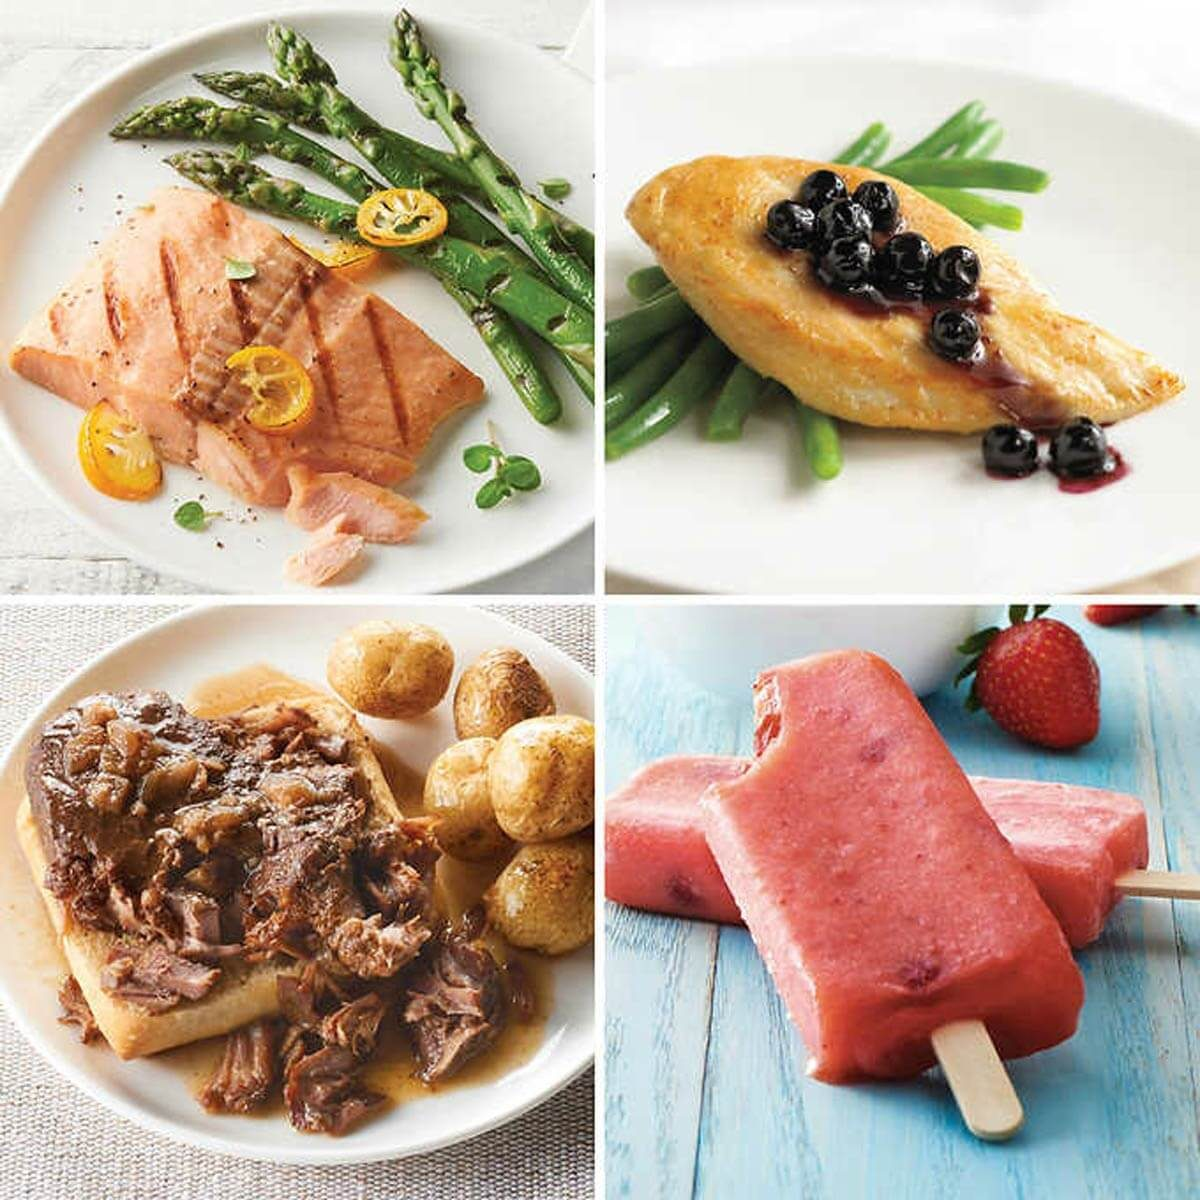 health food costco pack